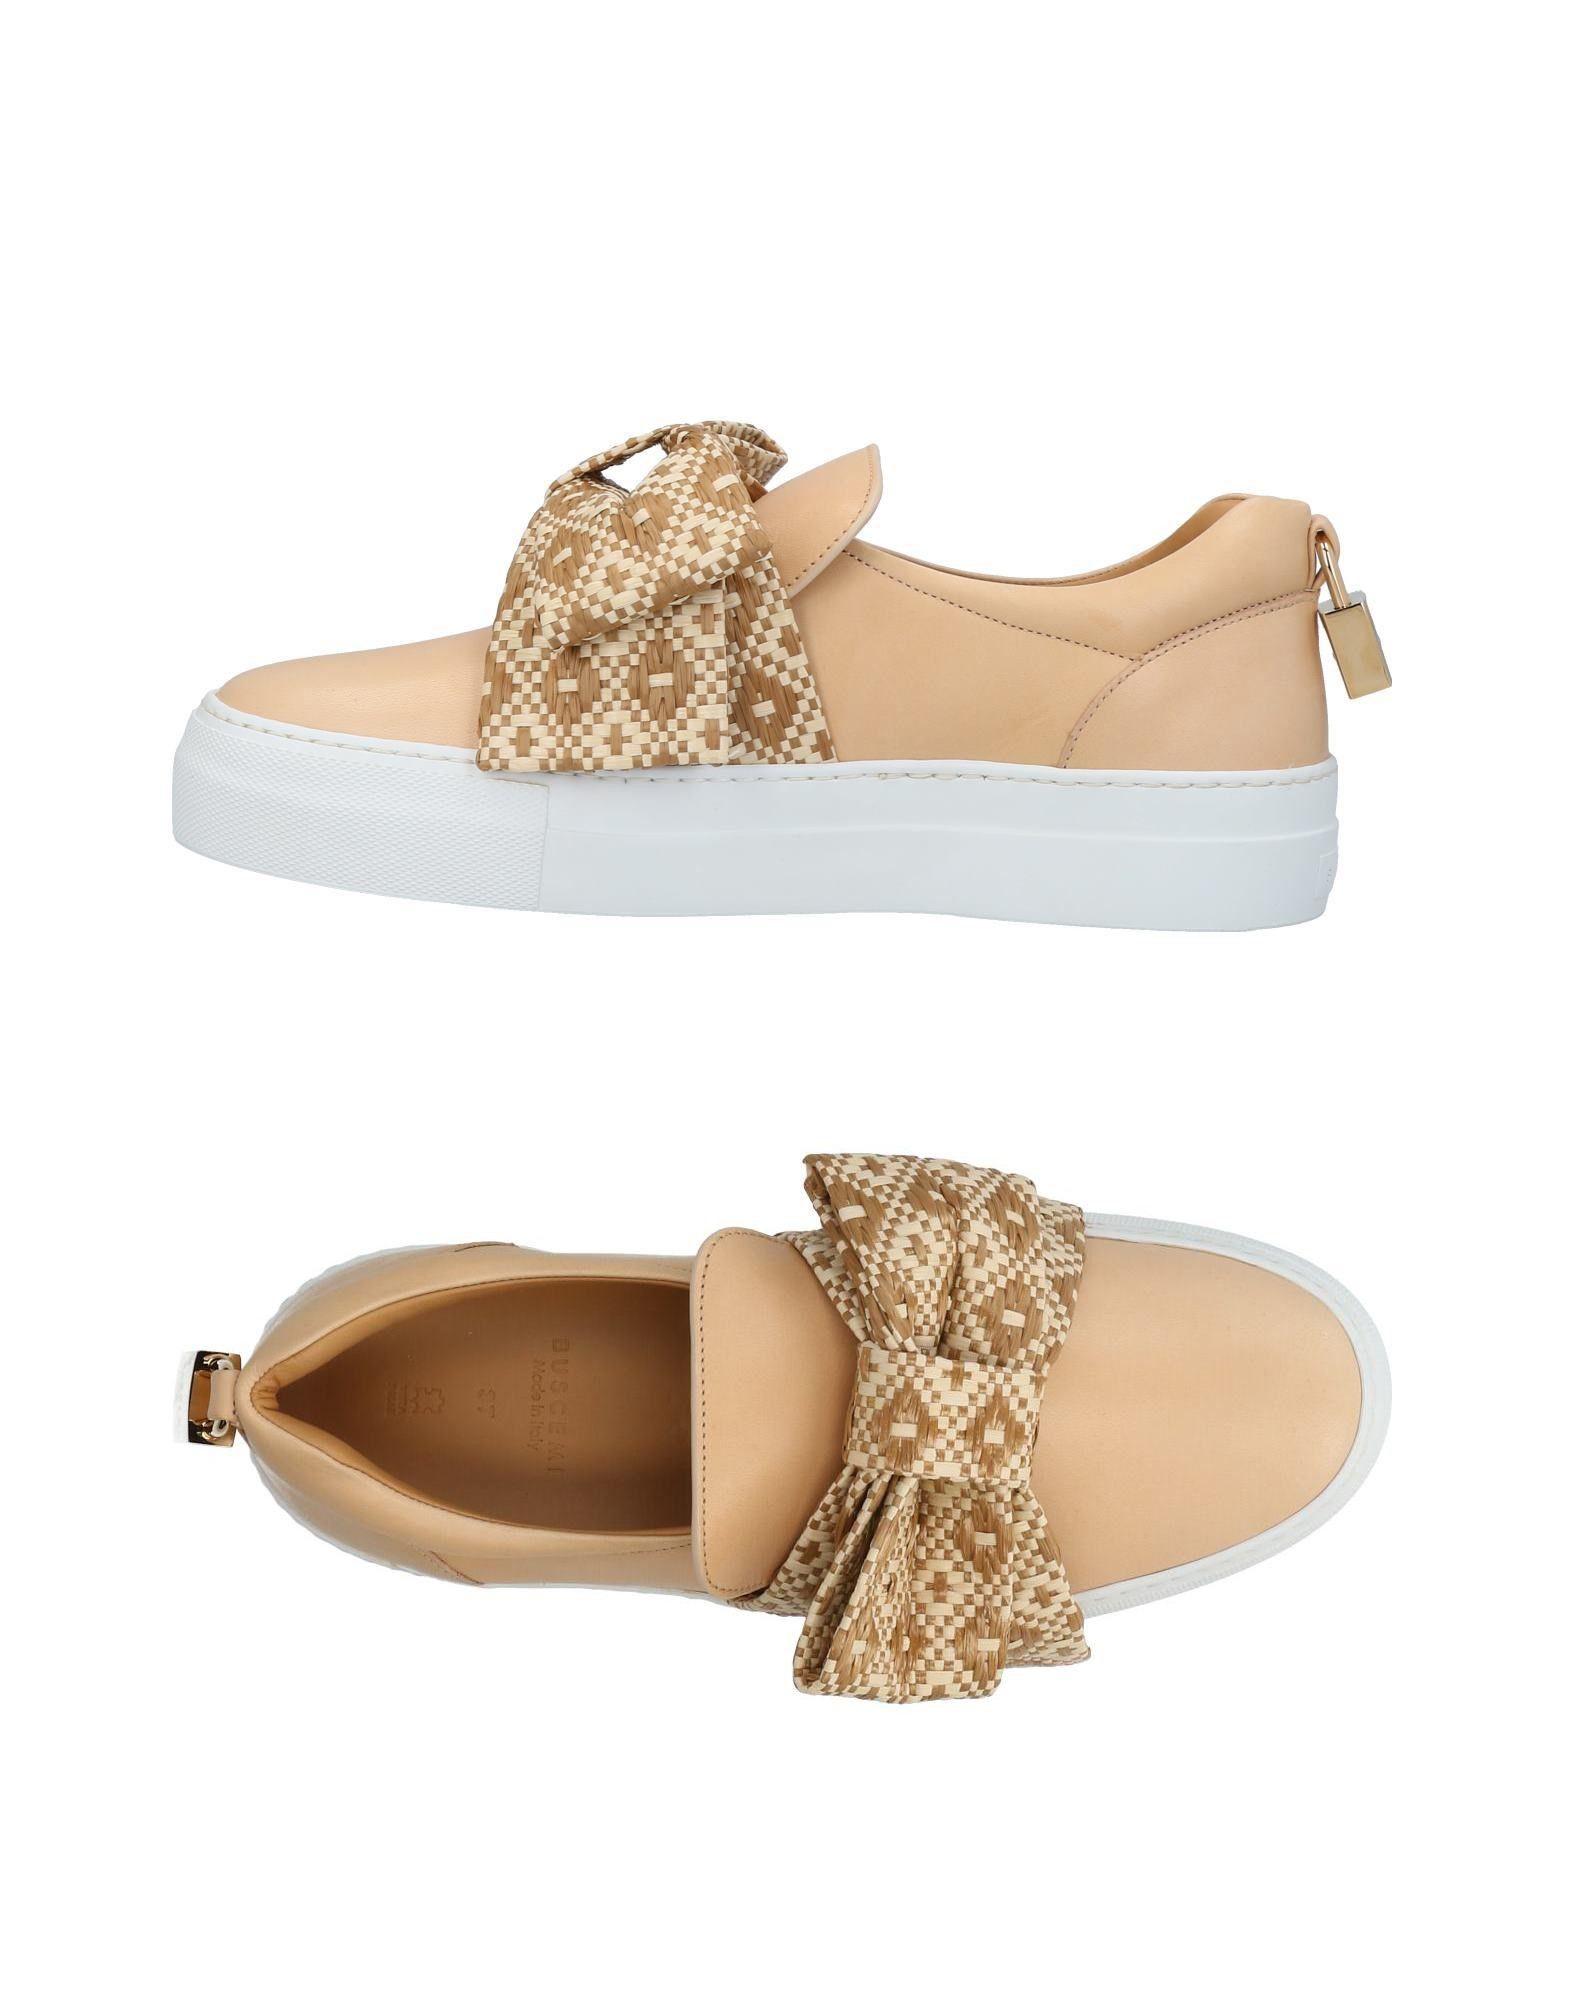 Buscemi aussehende Sneakers Damen  11426294UJGut aussehende Buscemi strapazierfähige Schuhe 8b8075